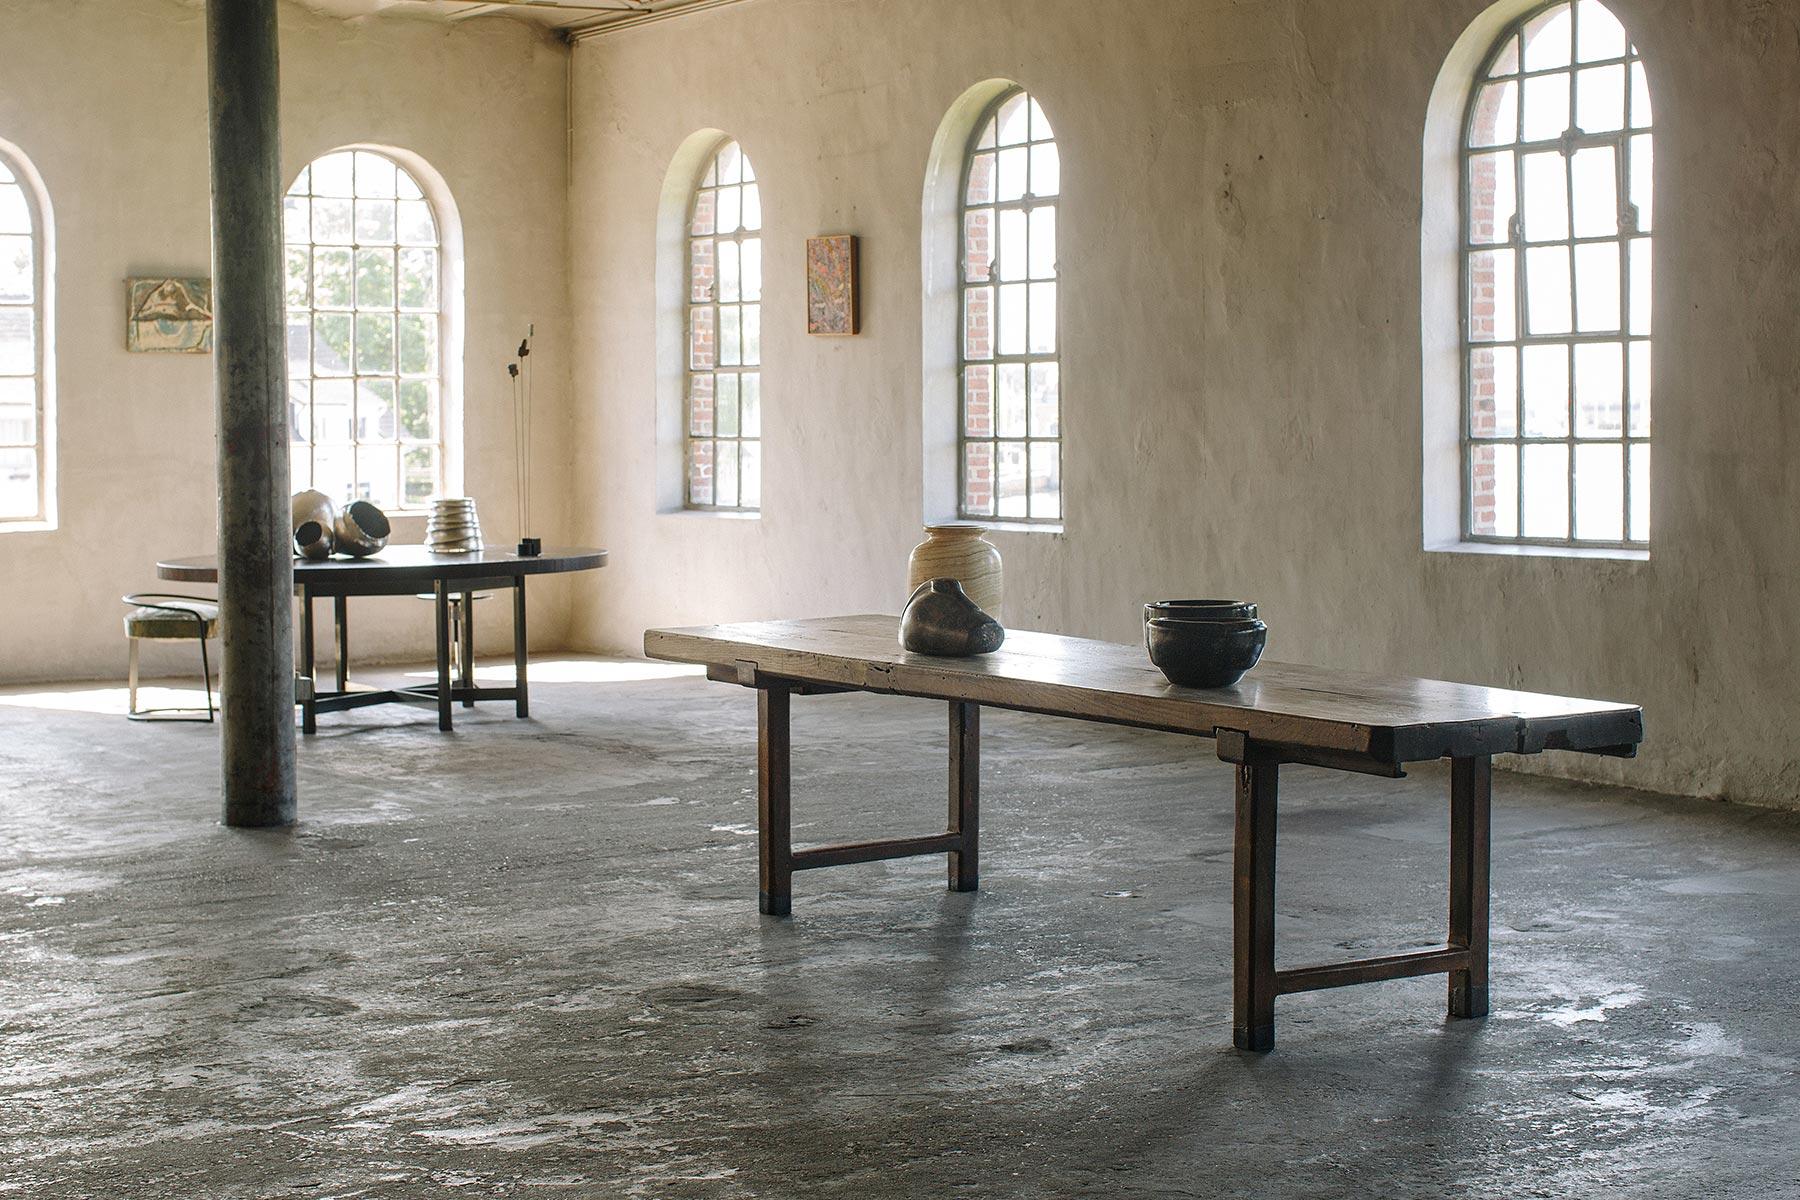 Axel Vervoordt Kanaal on Traditional Japanese House Interior